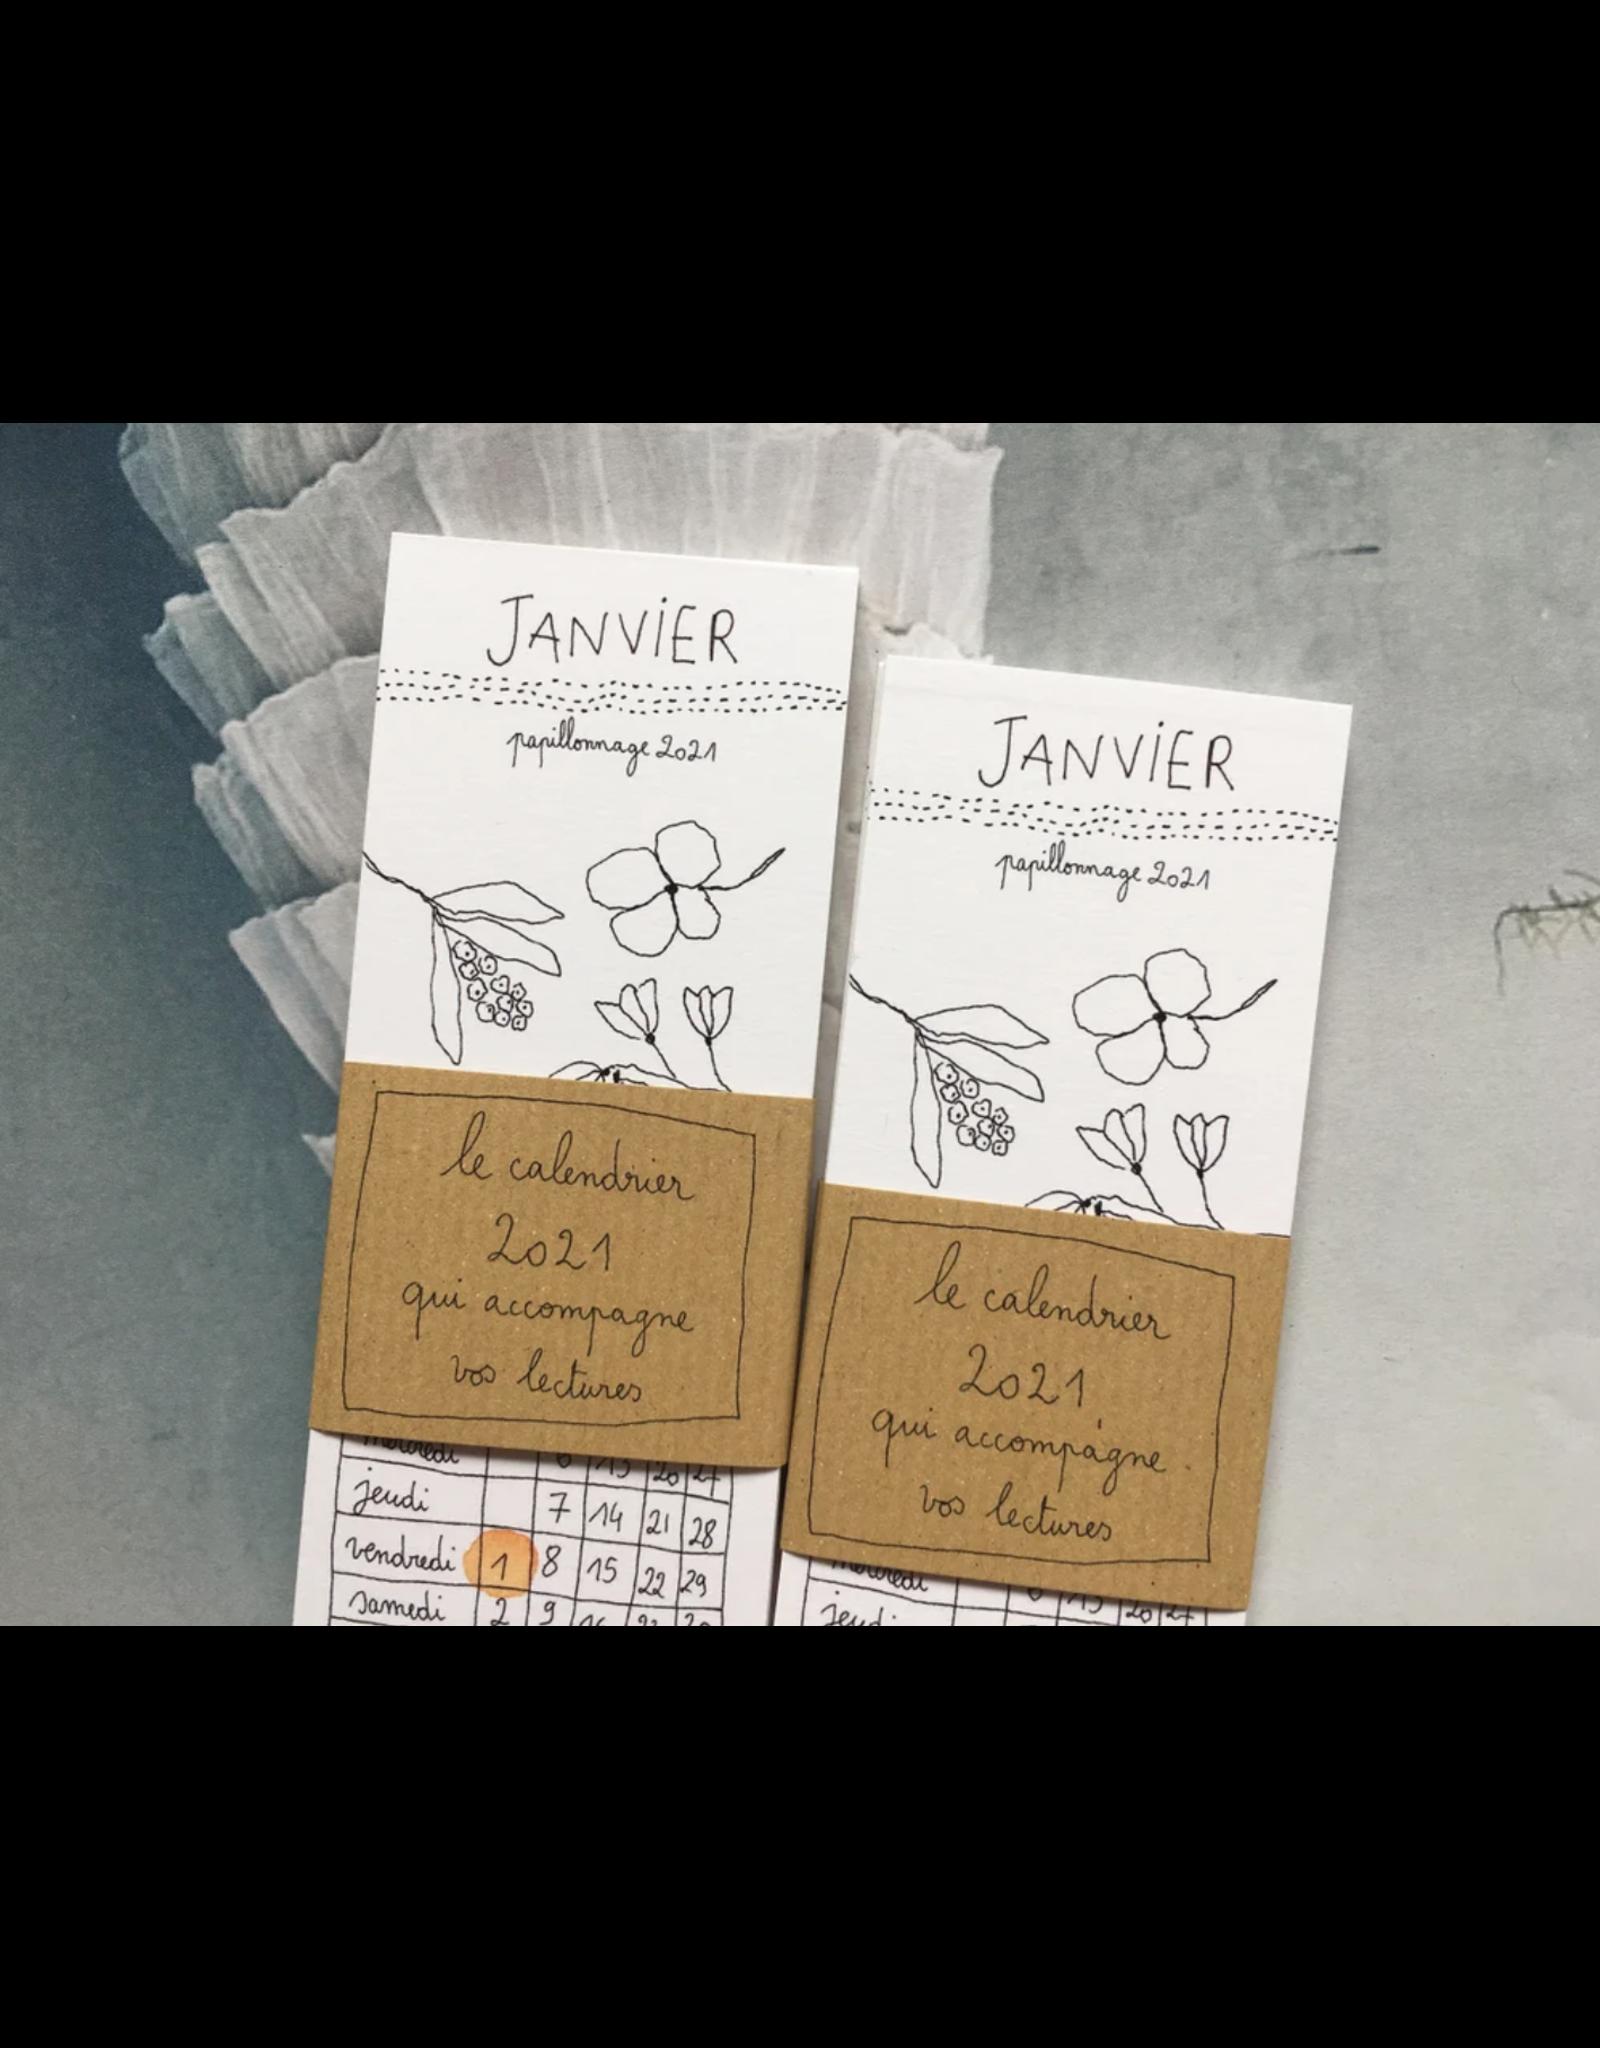 papillonage Kalender 2021 - Bladwijzers